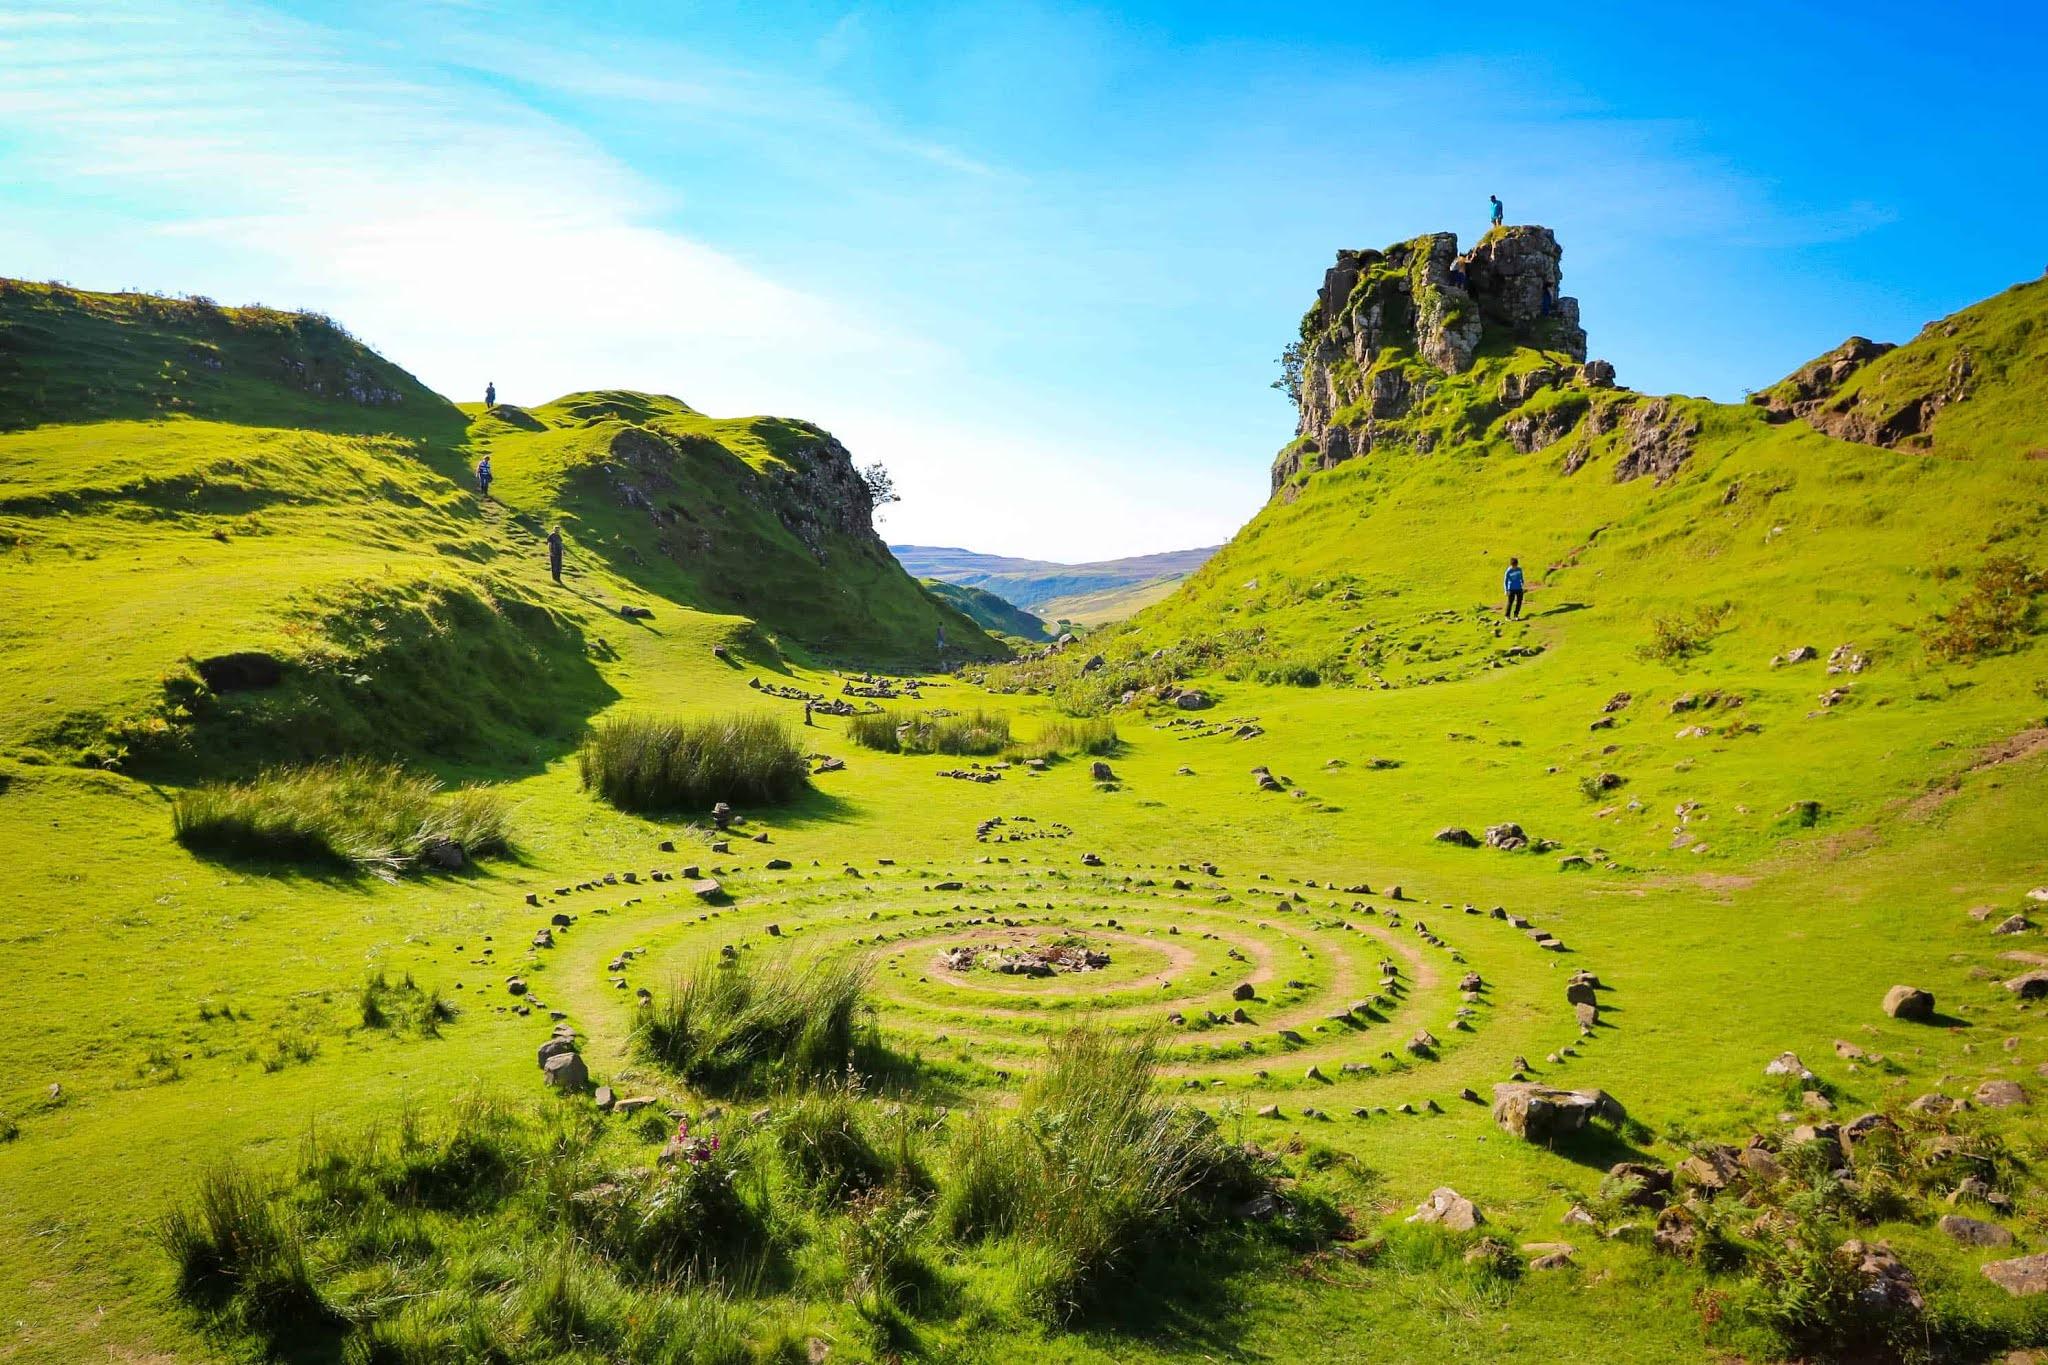 Сказочная долина на острове Скай в Шотландии